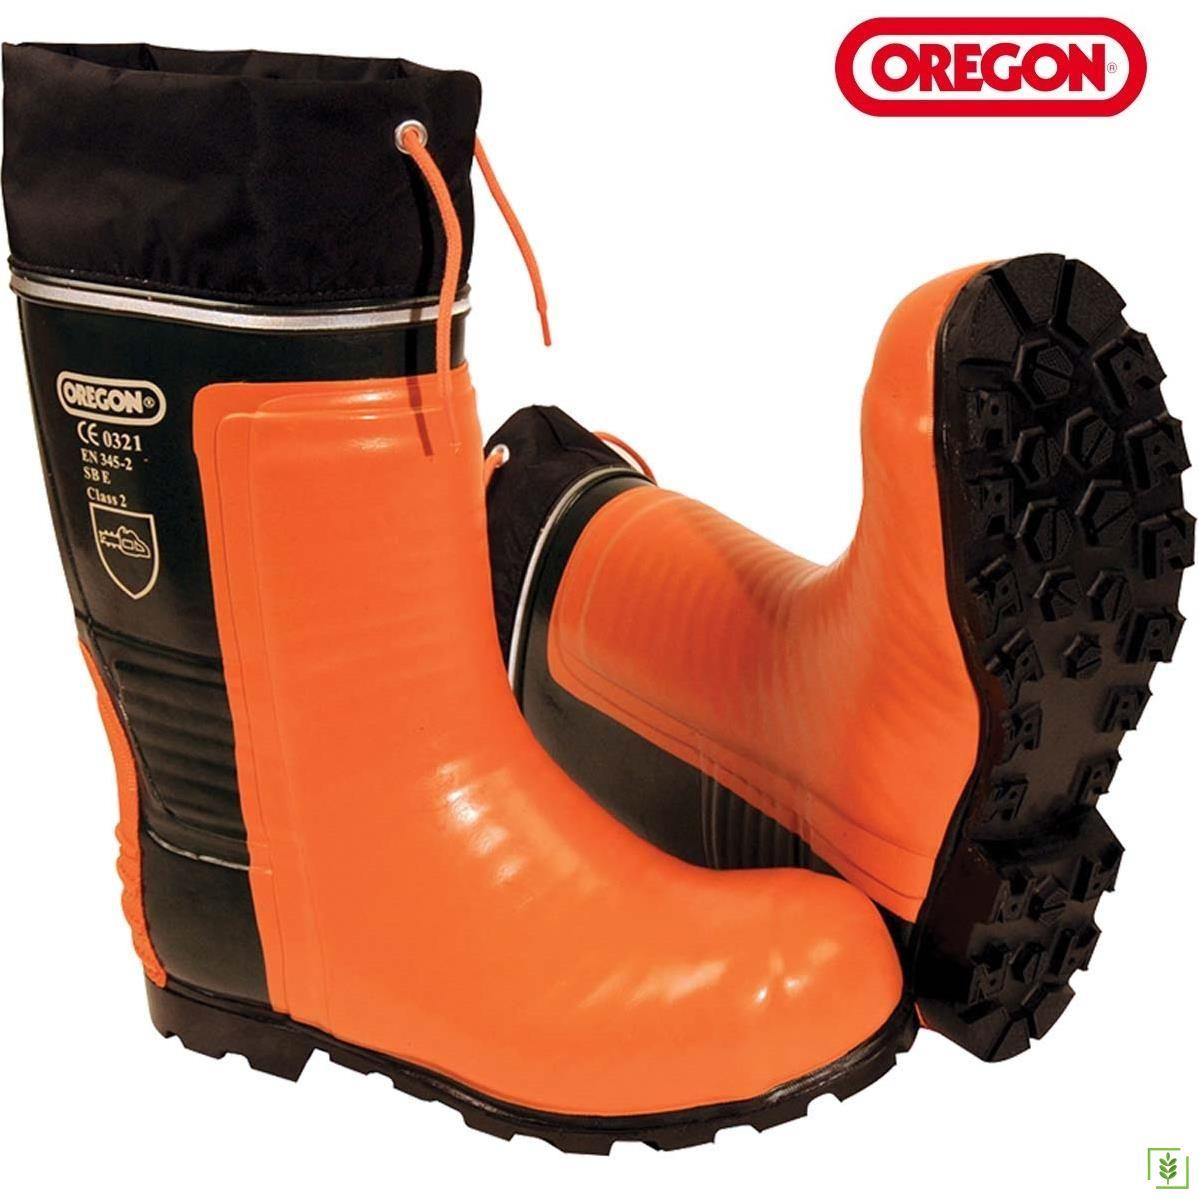 Oregon 295385/42 Zincir Kesmez Çizme 42 Numara